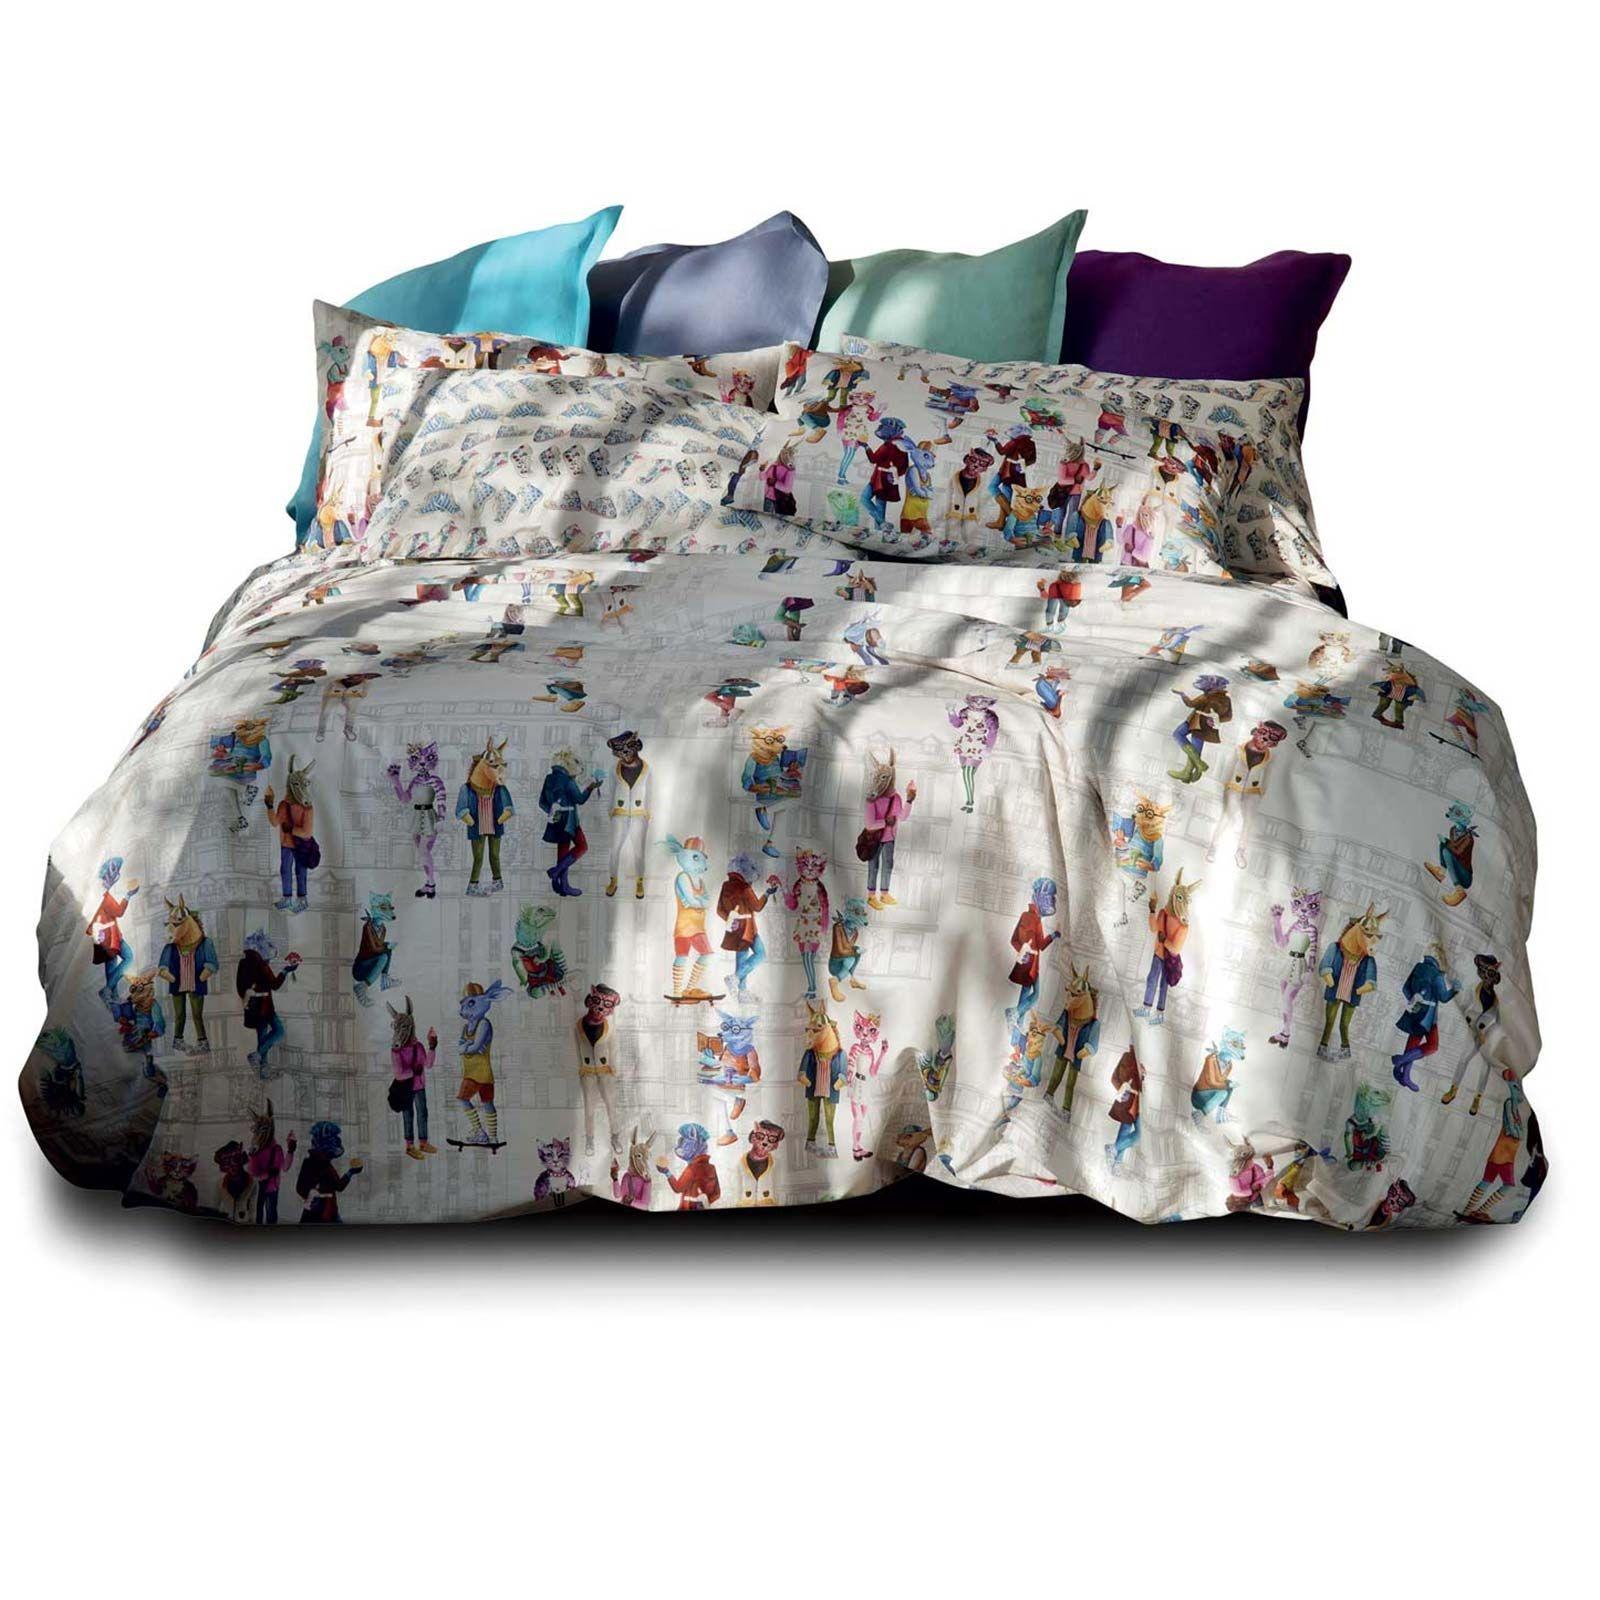 Copripiumino Matrimoniale Star Wars.Set Double Bed Sheets 2 Squares Pip Studio Darjeeling Bluette Effect